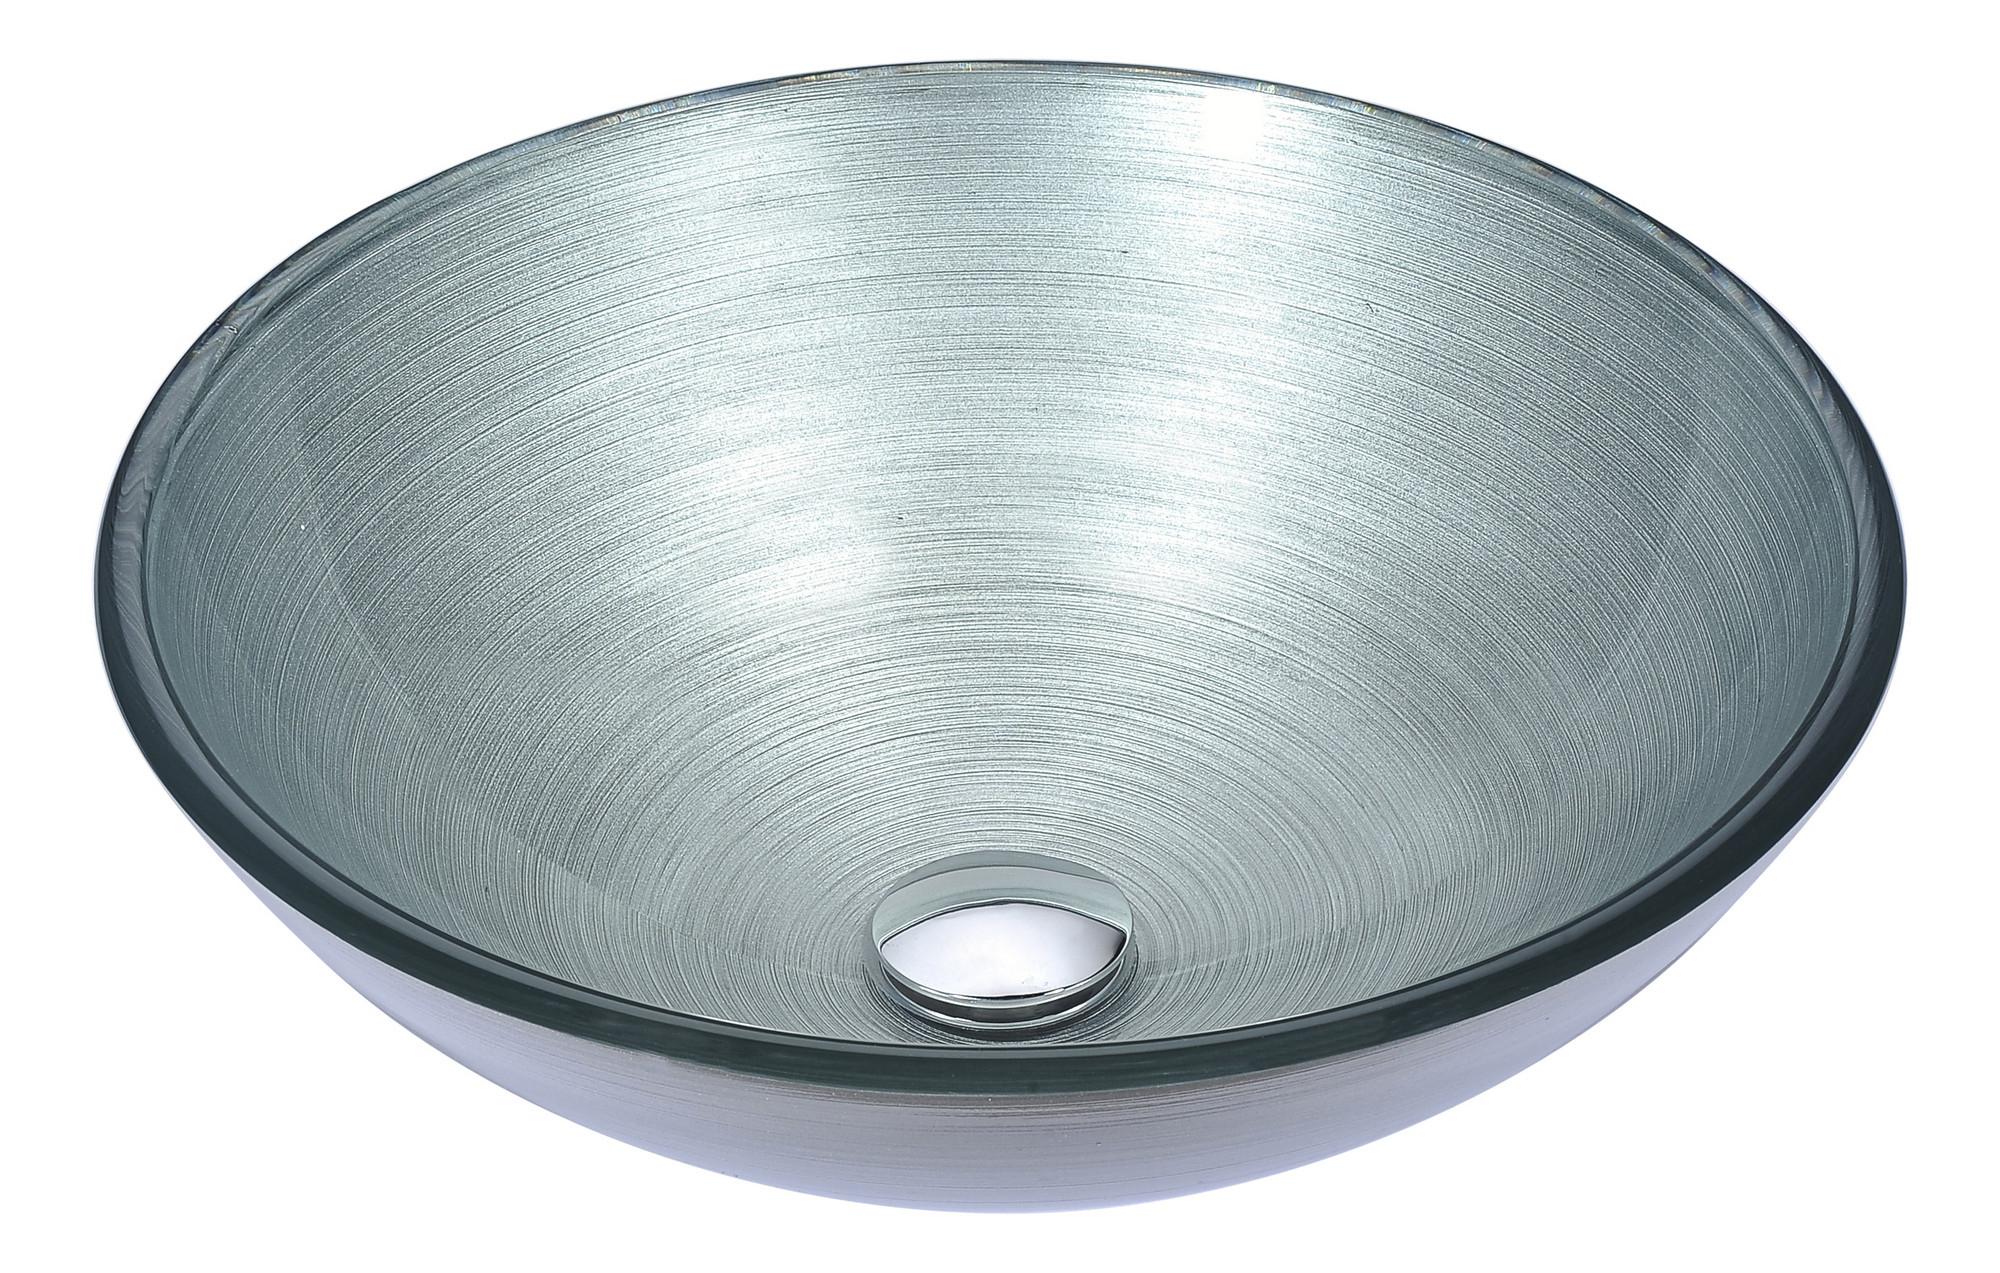 ANZZI LS-AZ283 Posh Seriaes Deco-Glass Vessel Sink In Brushed Silver